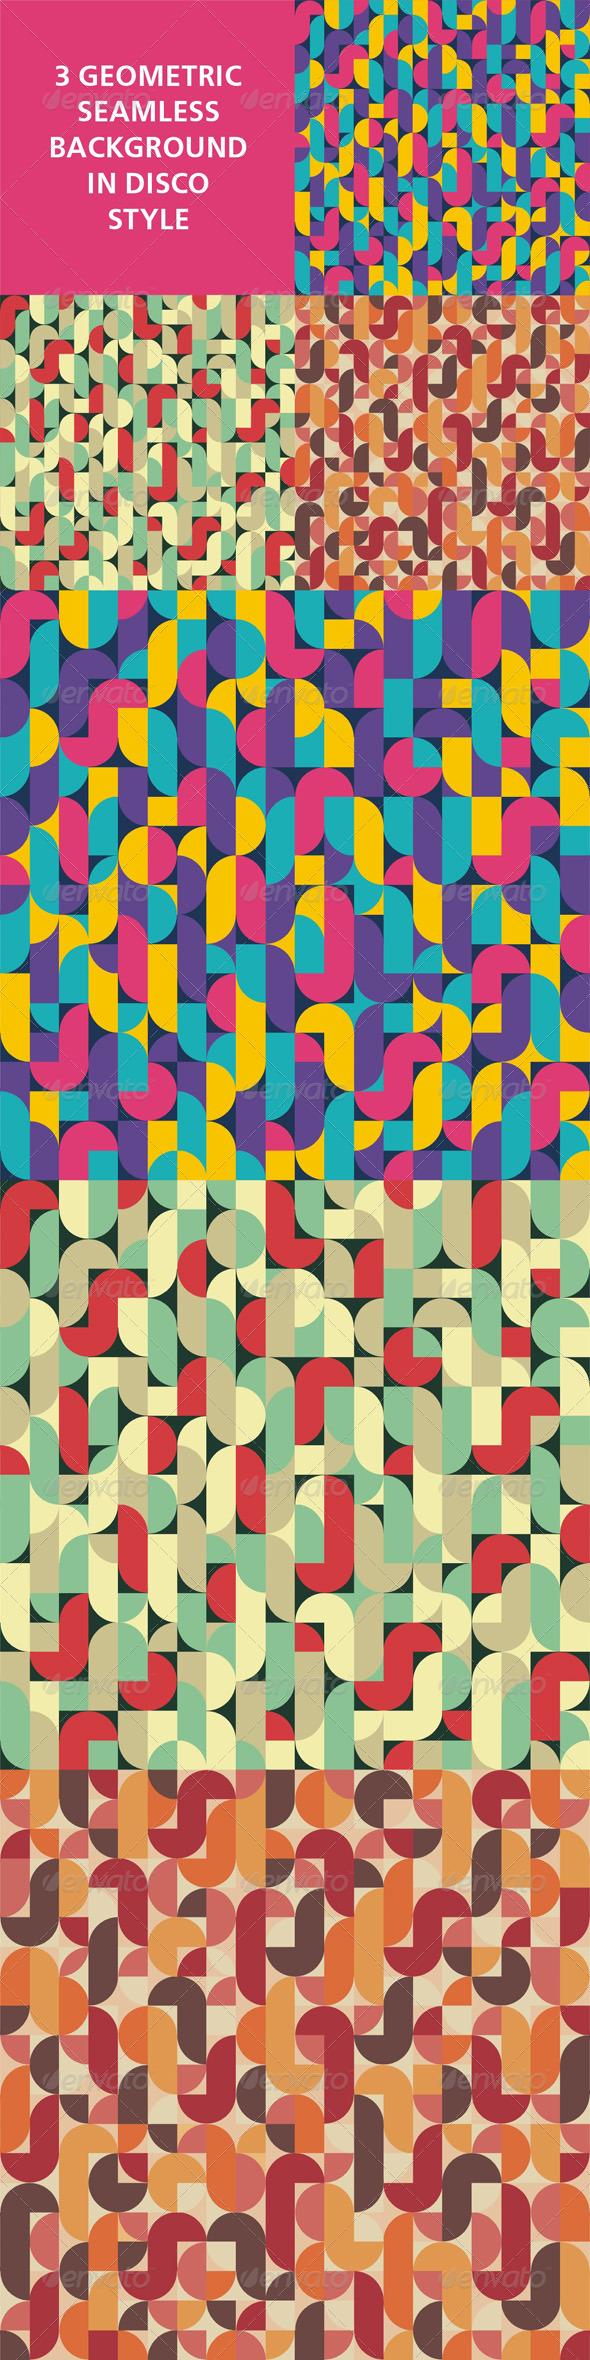 Geometric Seamless Background 03 - Backgrounds Decorative